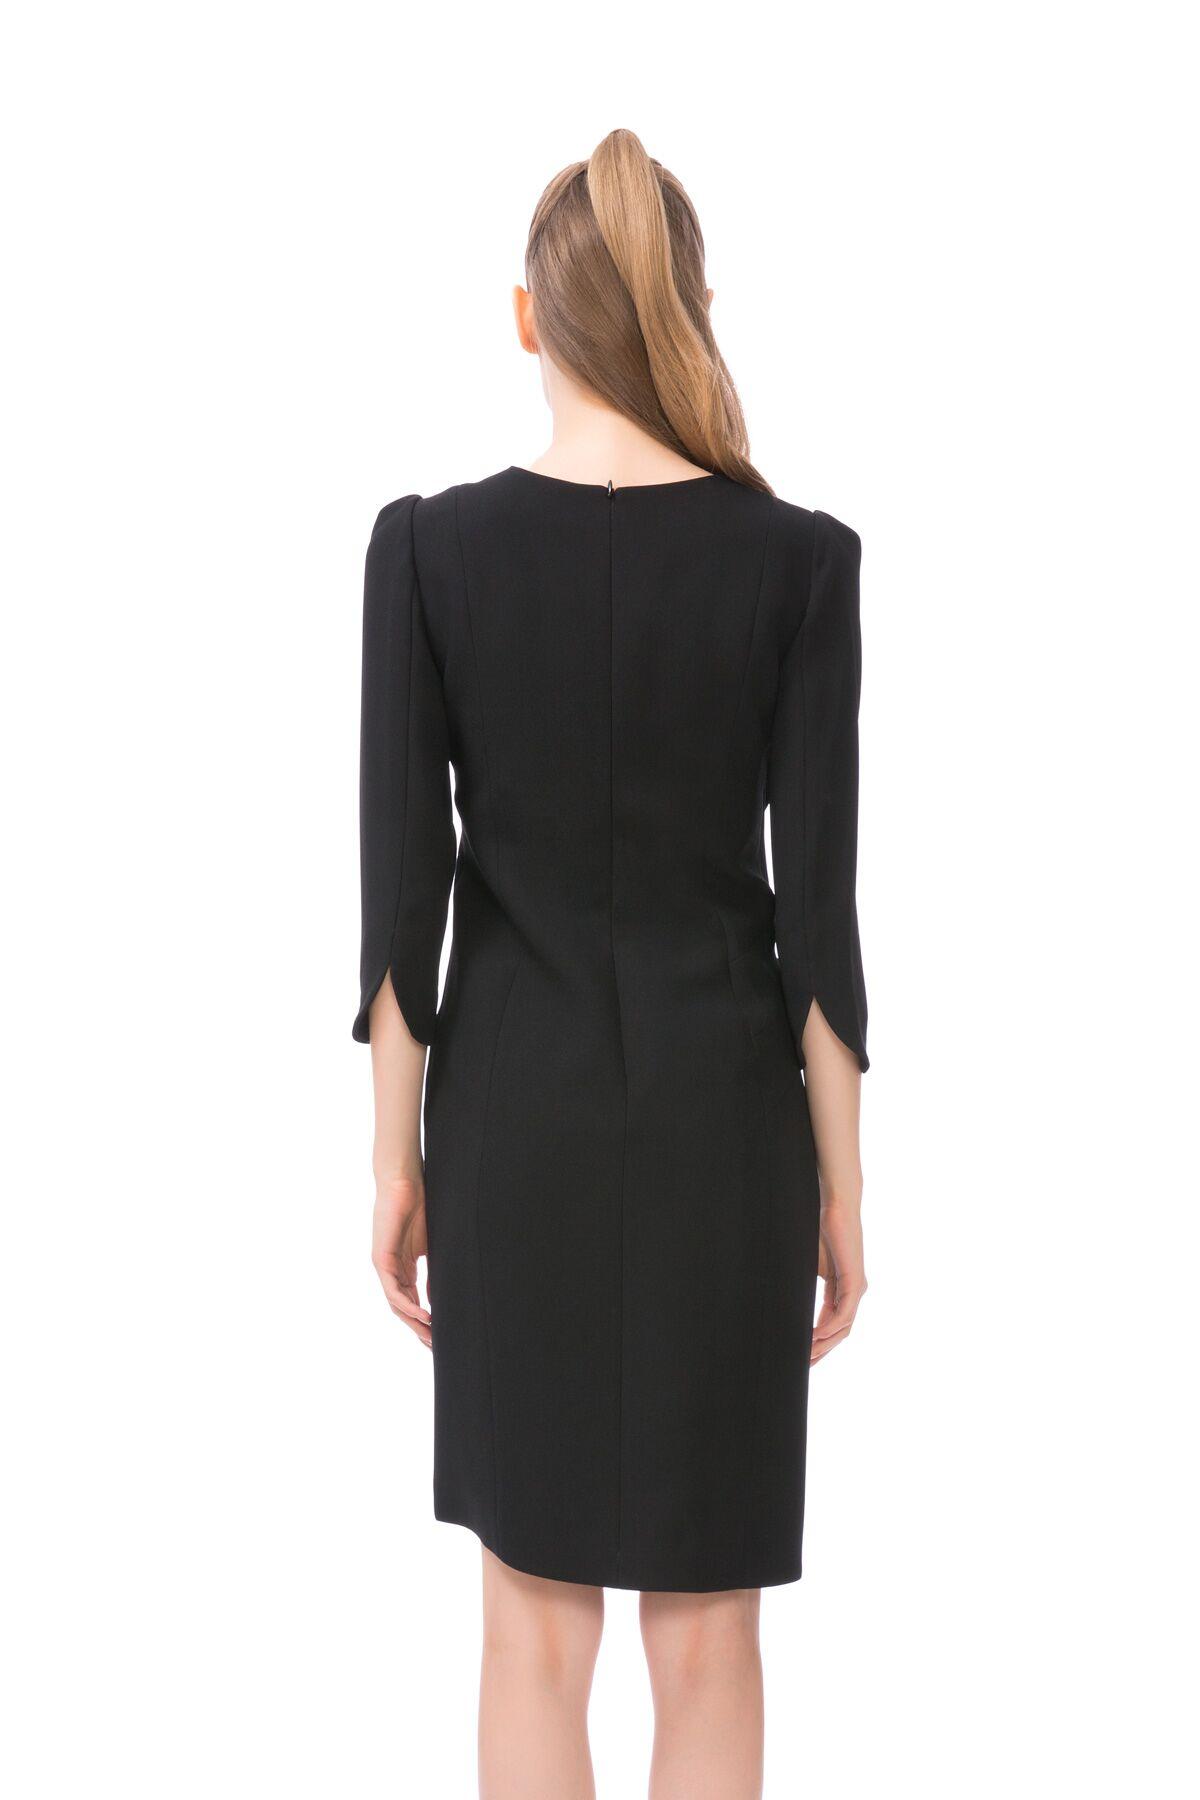 Bel İşleme Detaylı Truvakar Kol Siyah Mini Elbise